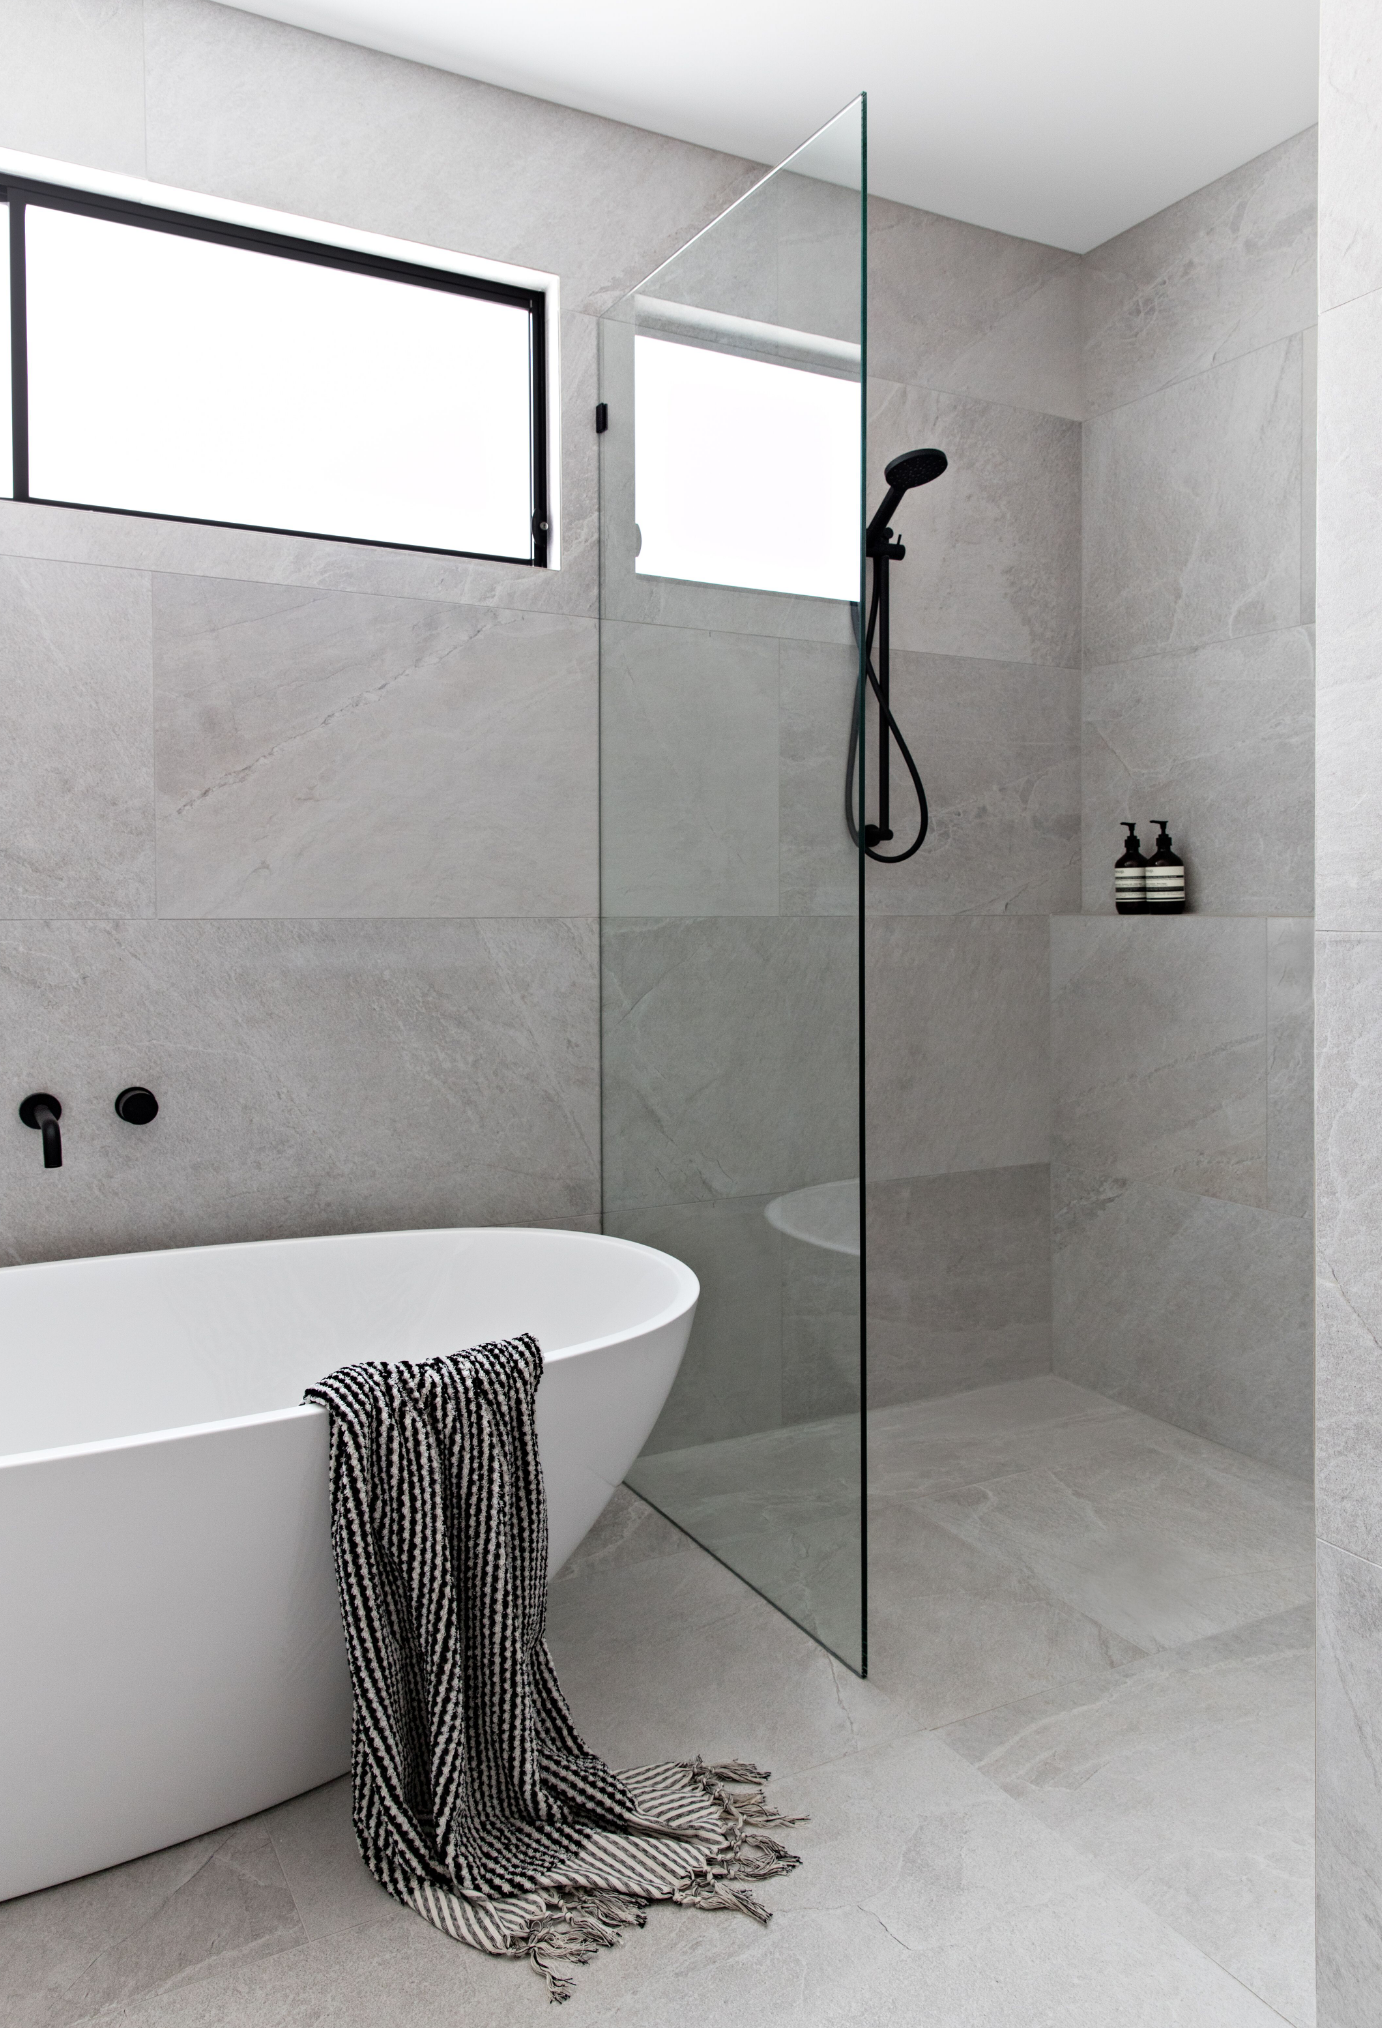 Picking The Perfect Tile Zephyr Stone, White Stone Tile Bathroom